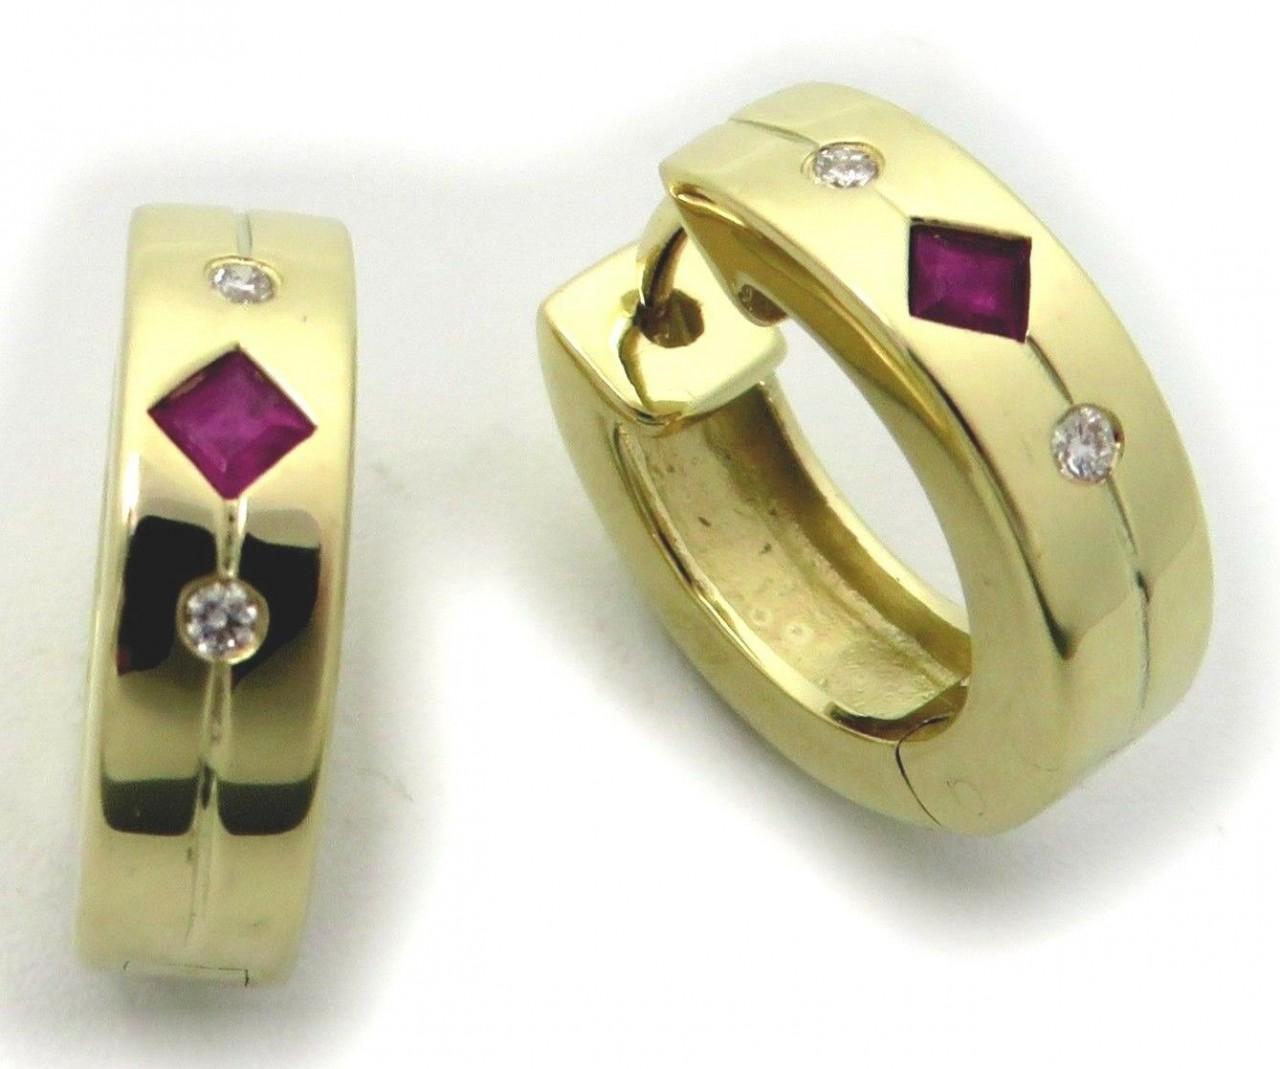 Neu Ohrringe Klapp Creolen Rubin Brillant 0,04 ct echt Gold 585 Gelbgold Diamant